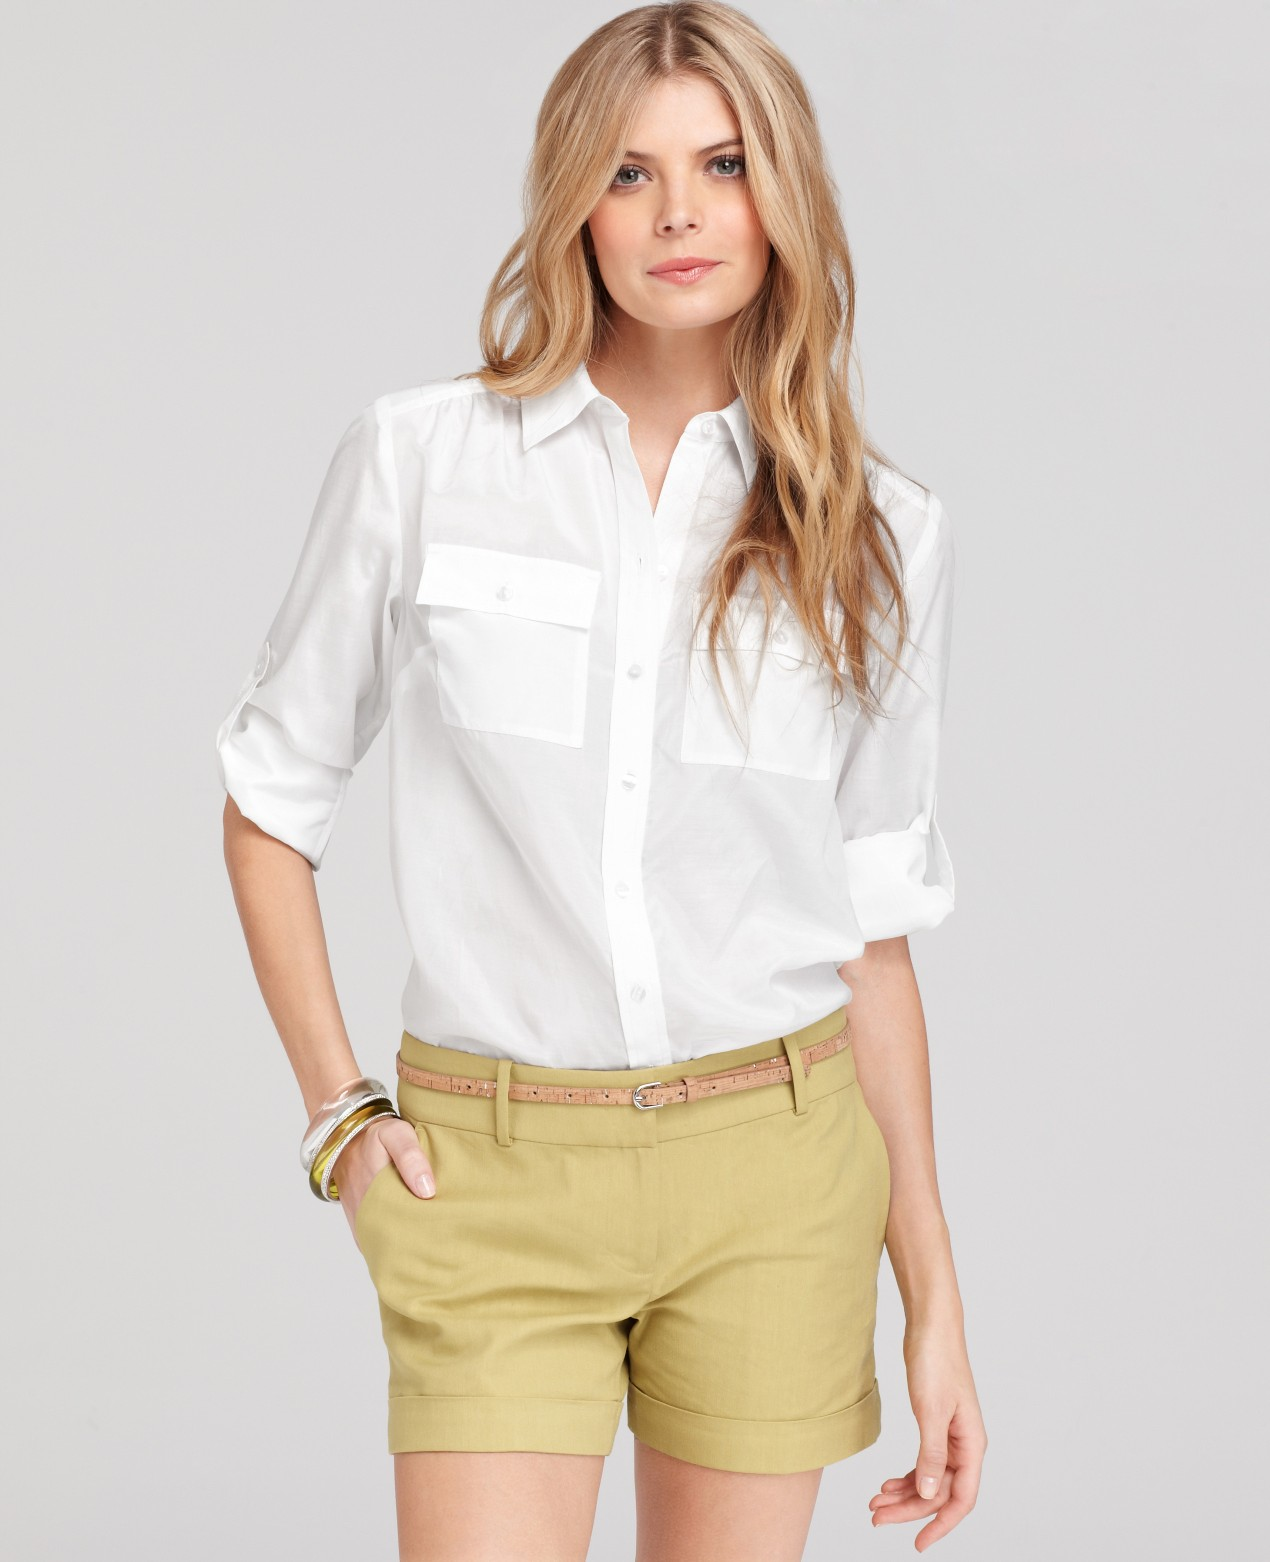 762a884712ef4 Lyst - Ann Taylor Petite Silk Cotton Button Down Camp Shirt in White